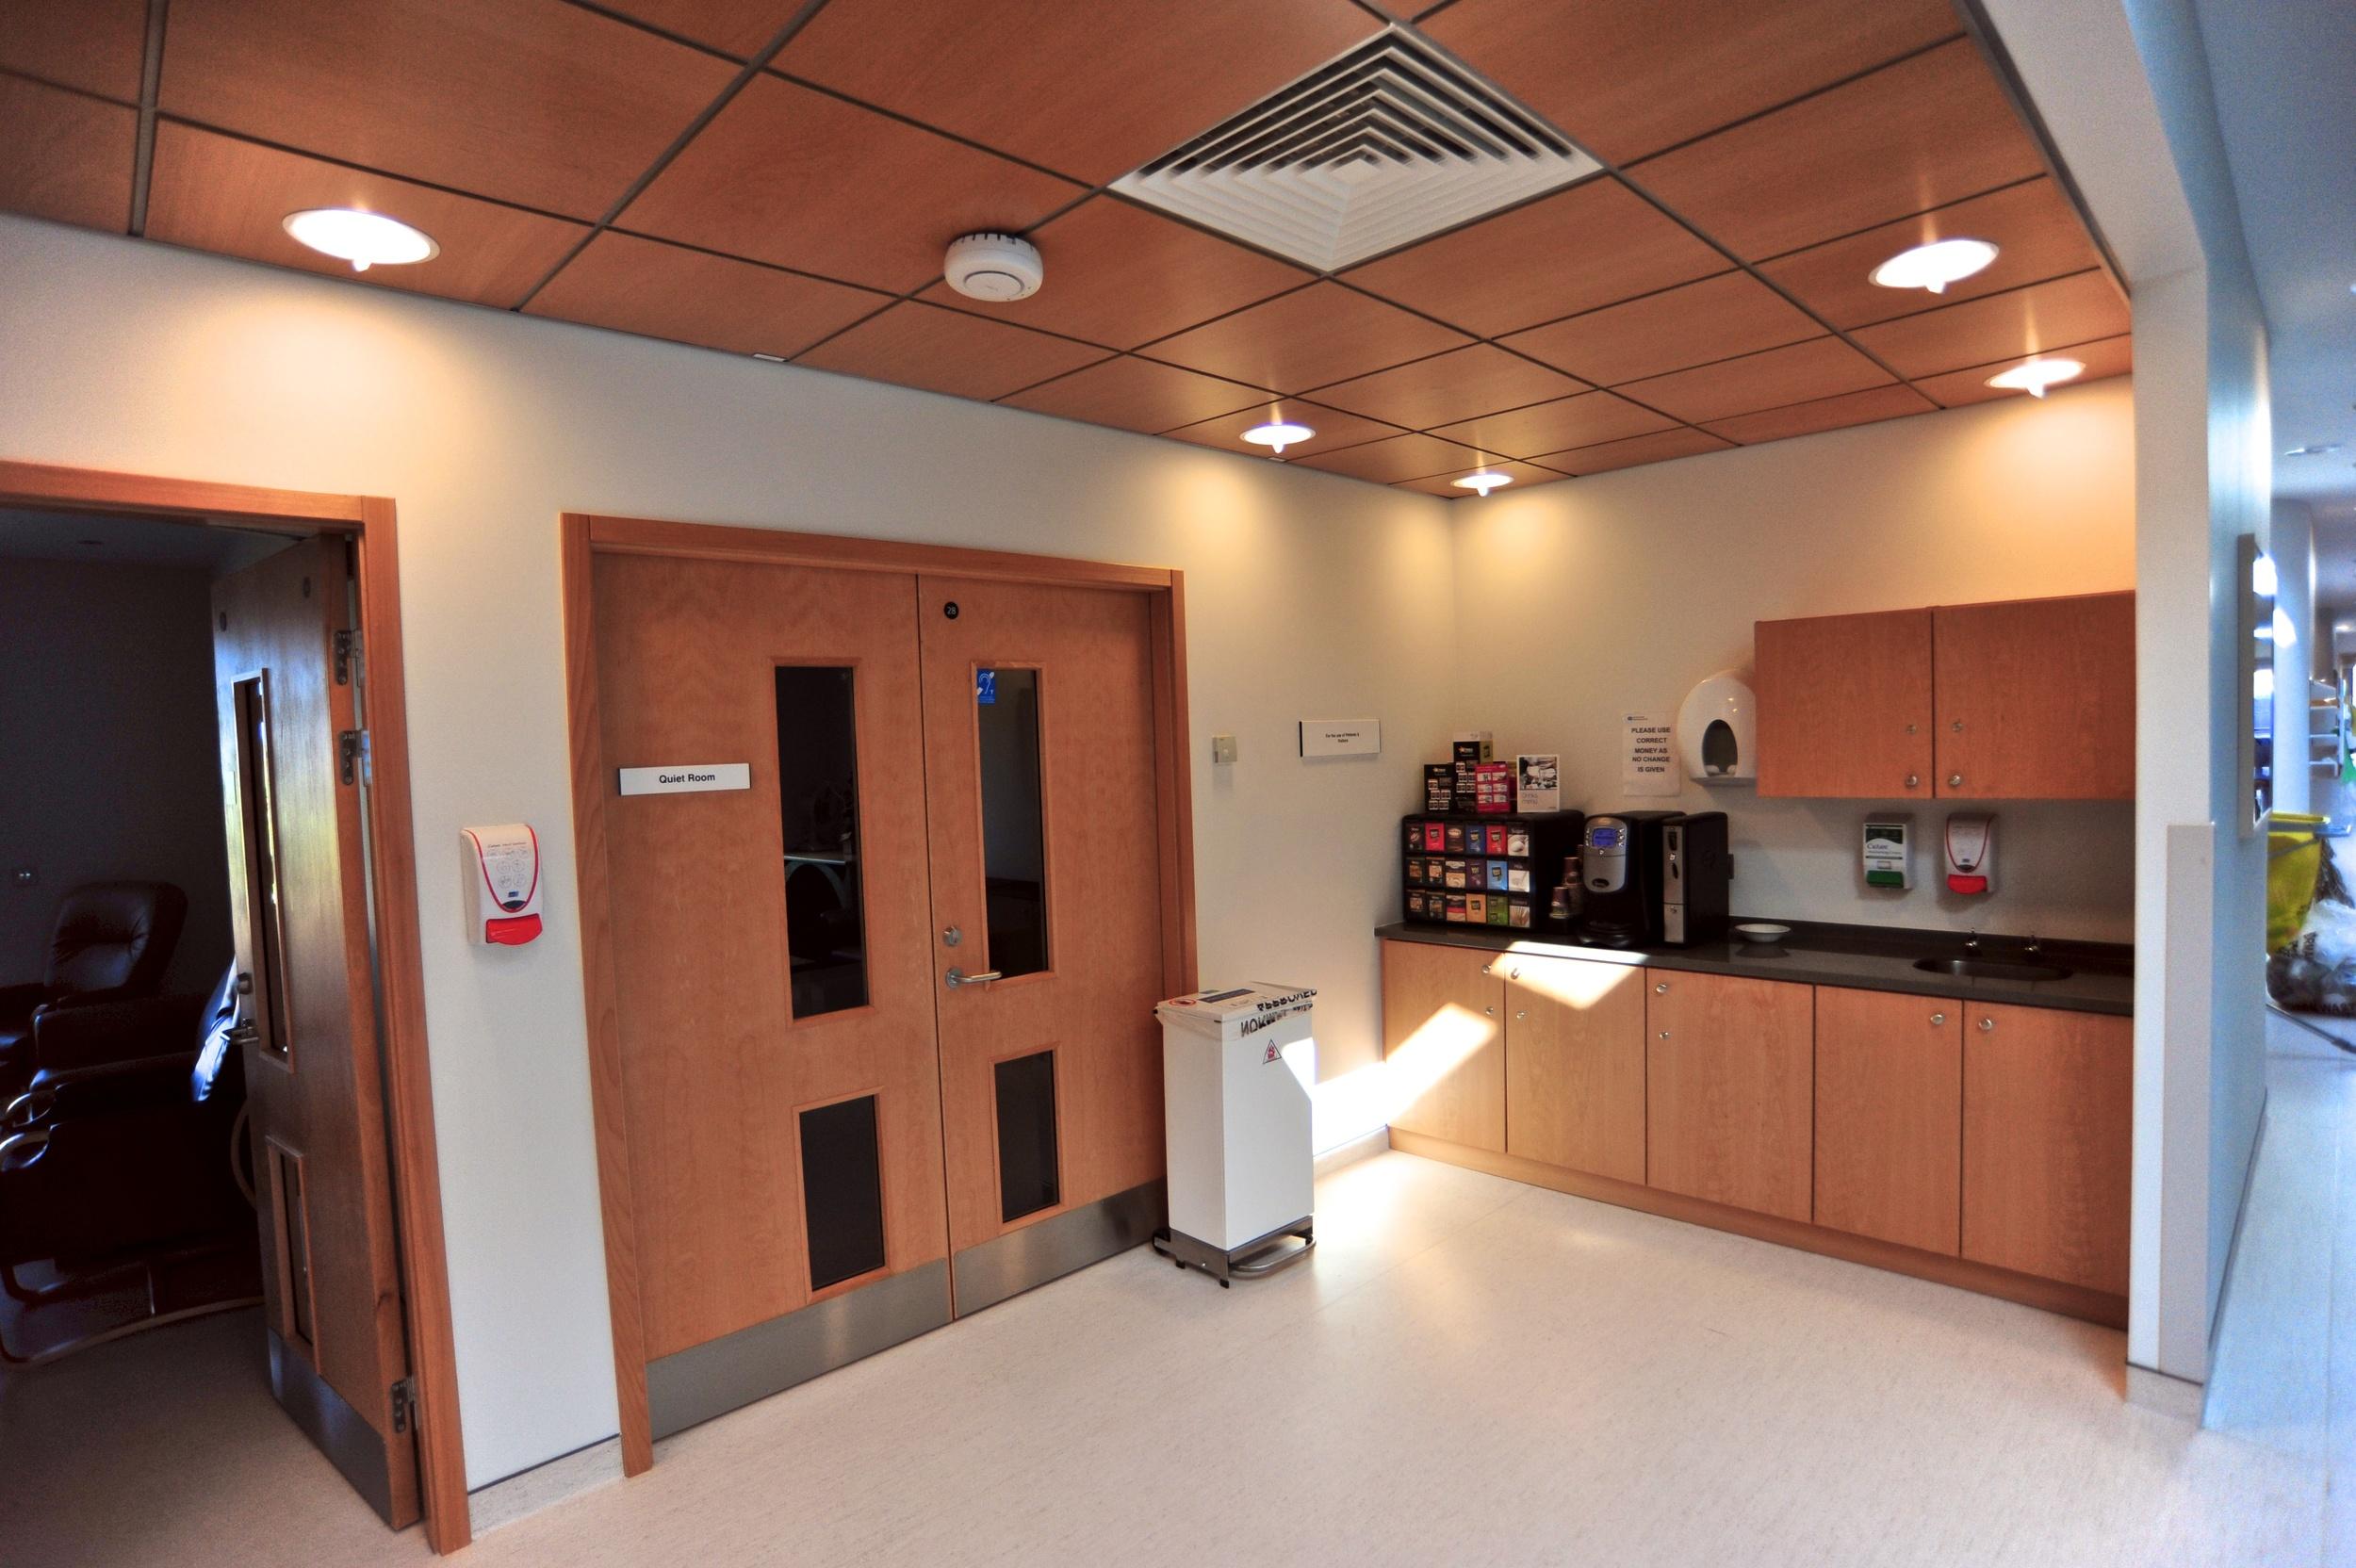 Macmillan Unit, Antrim Hospital